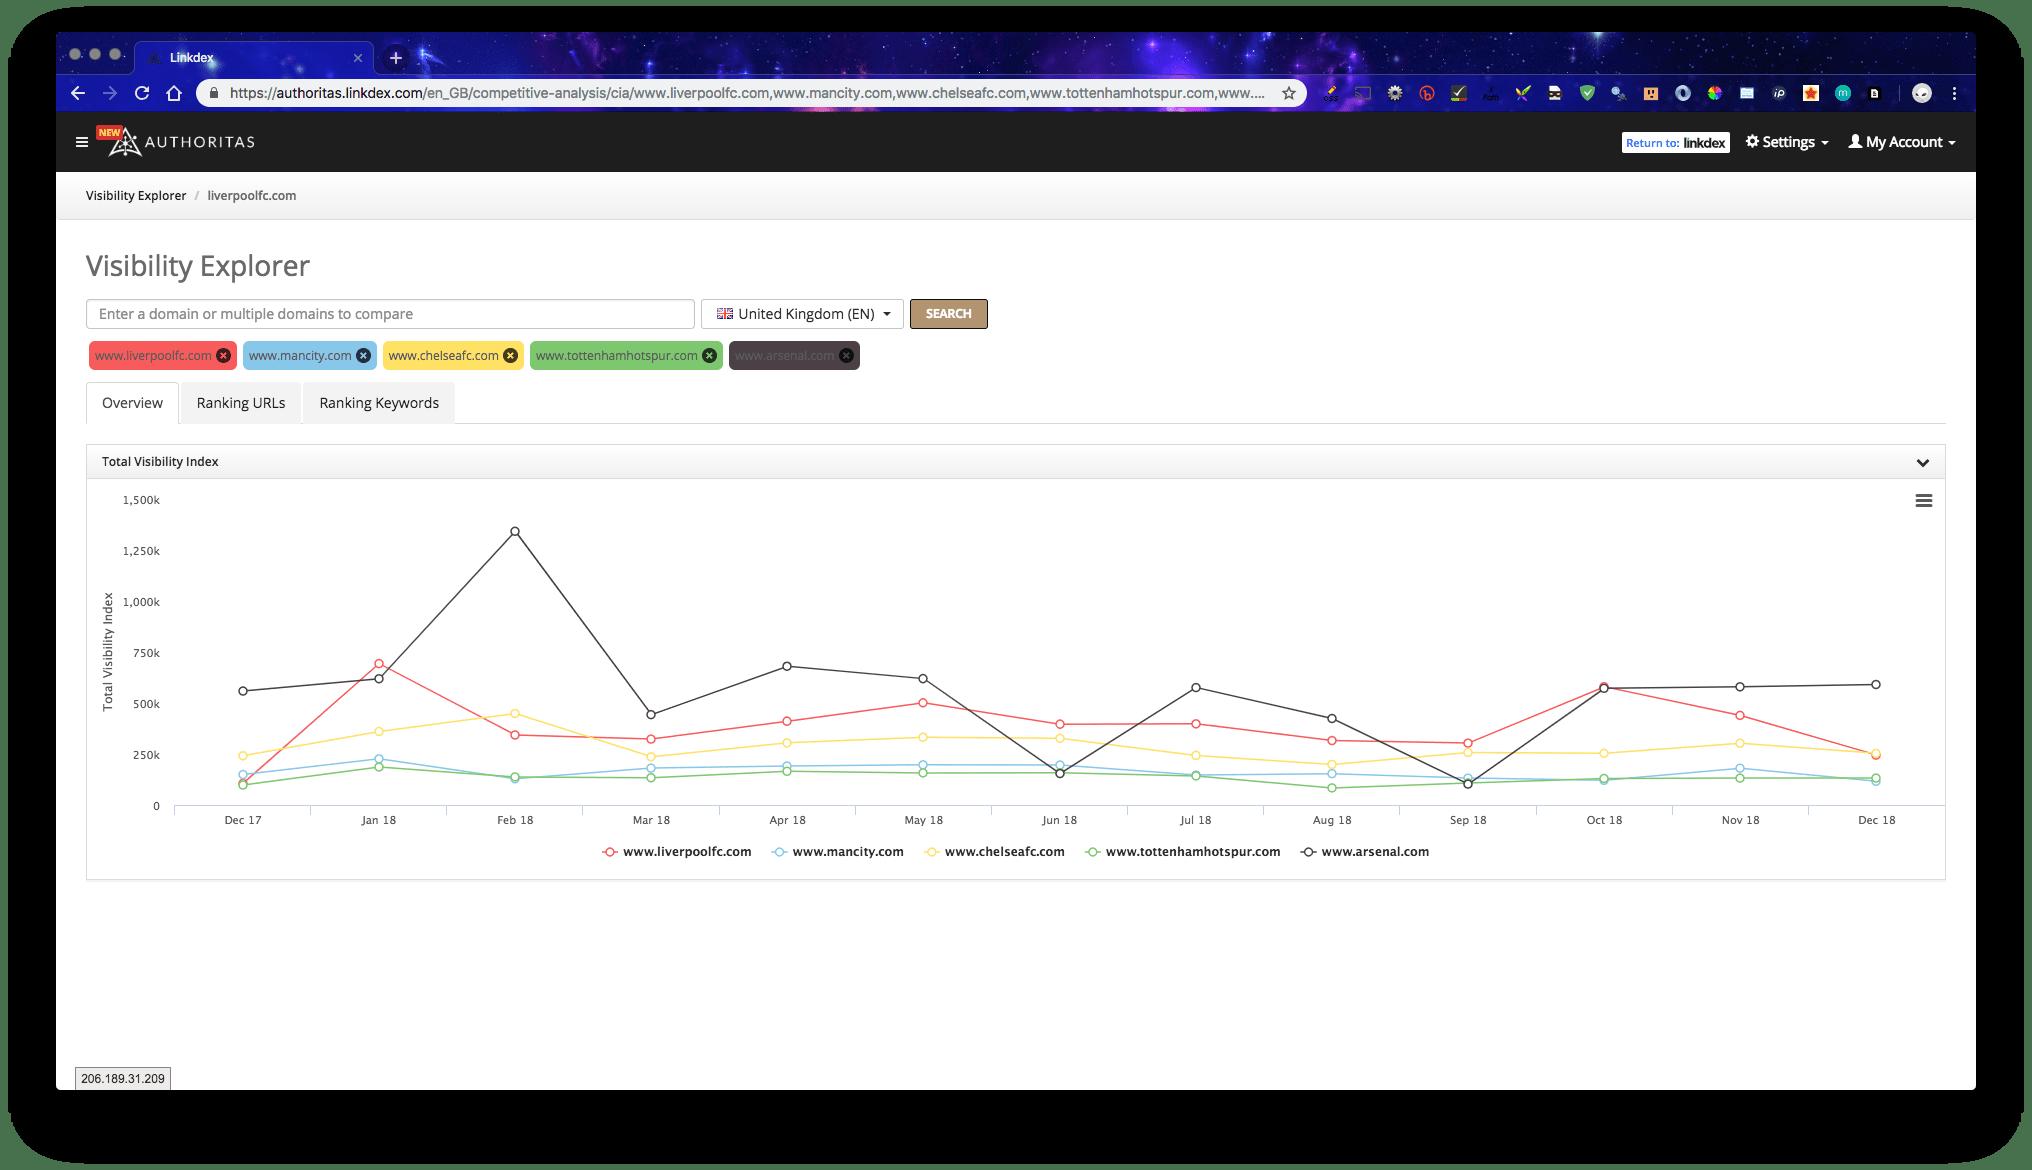 Authoritas: Visibility Explorer module